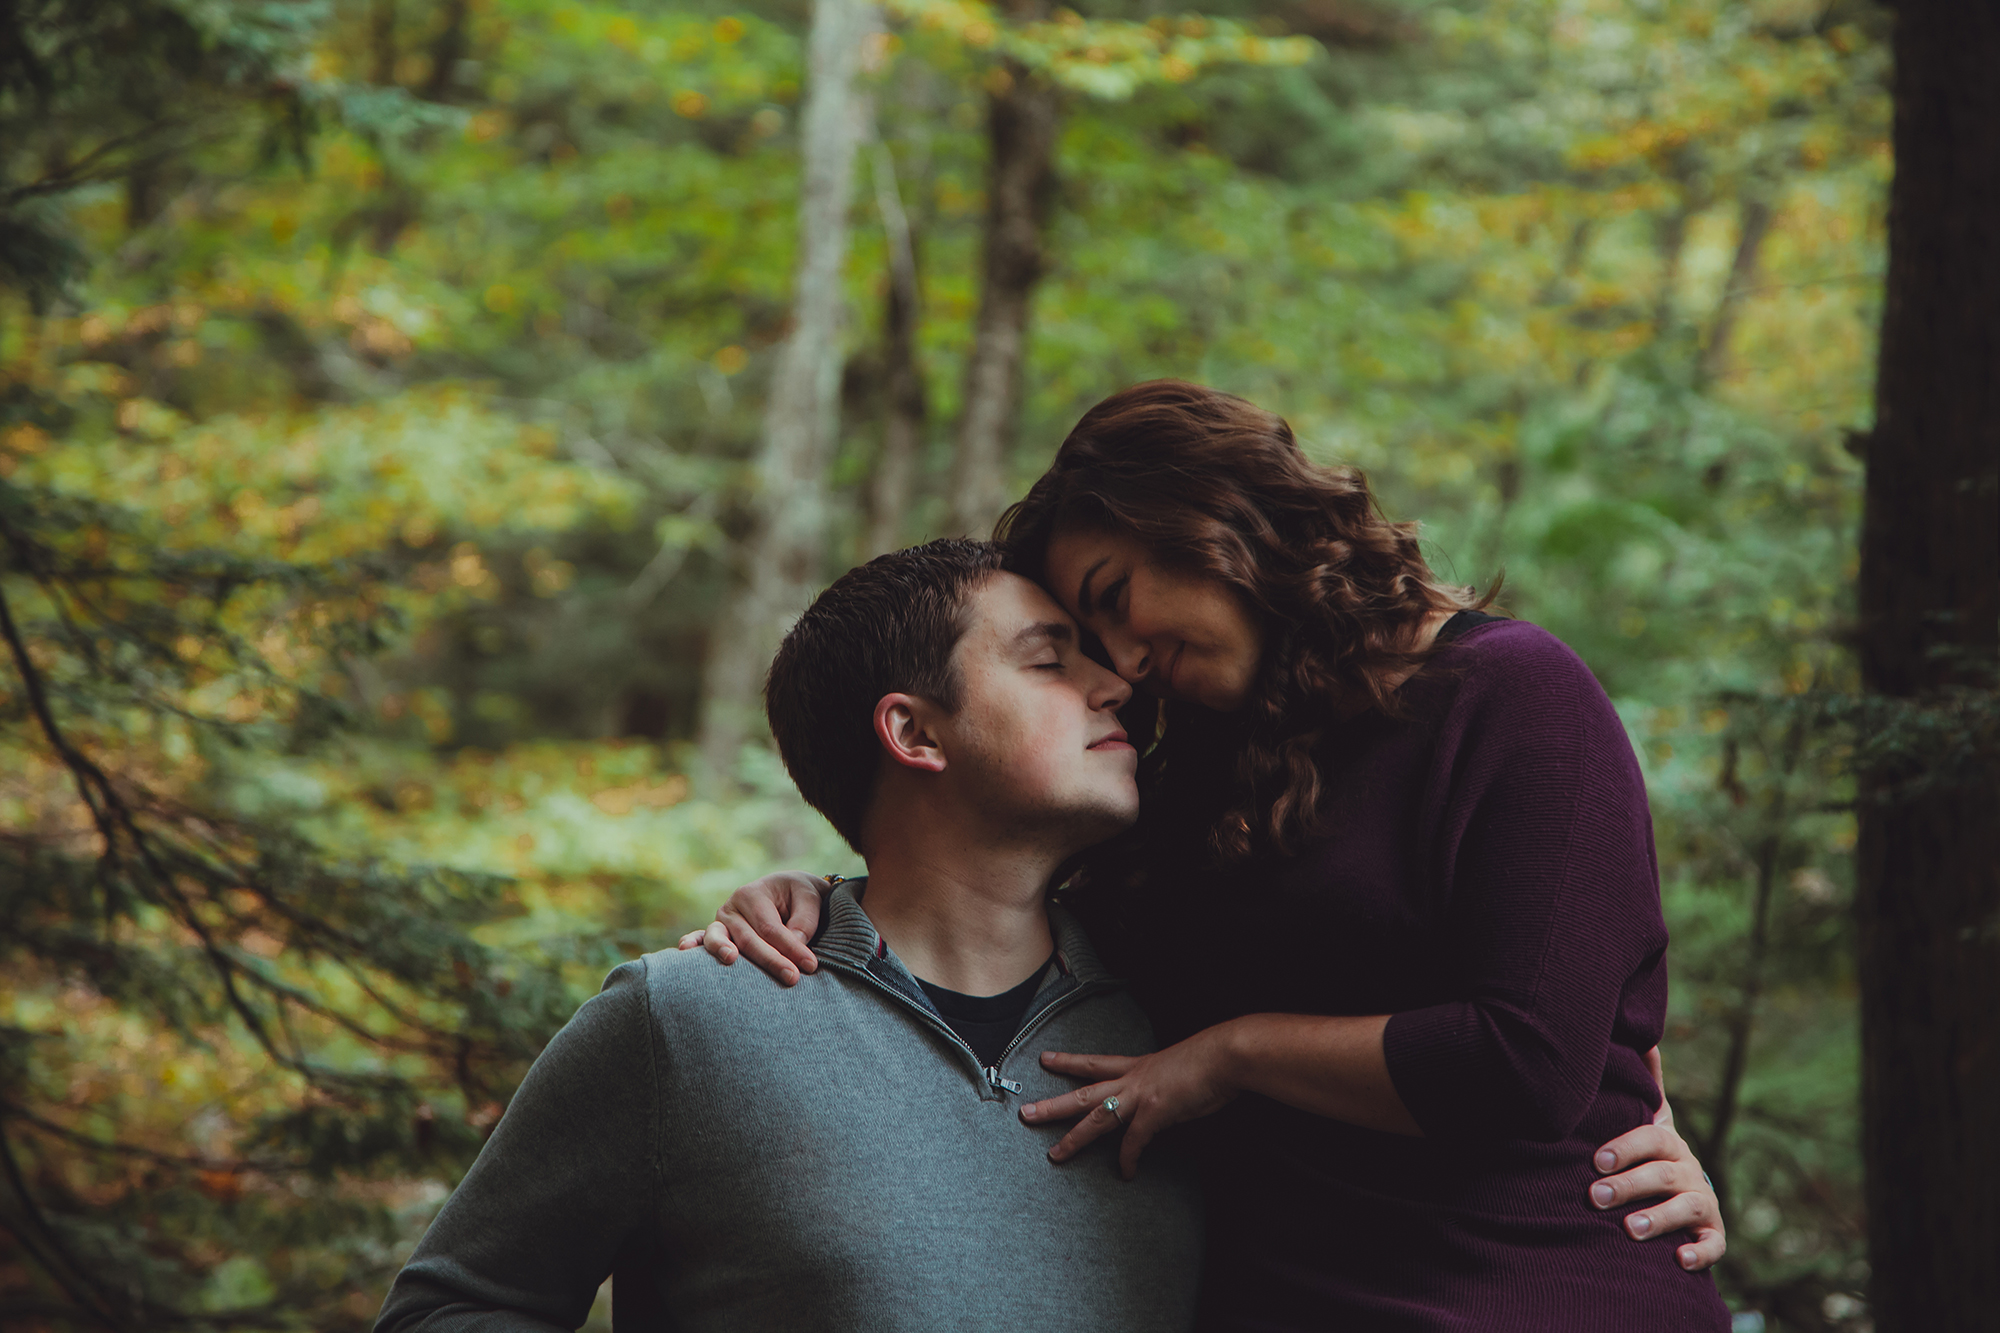 Engagement photo session at Chittenango Falls State Park.